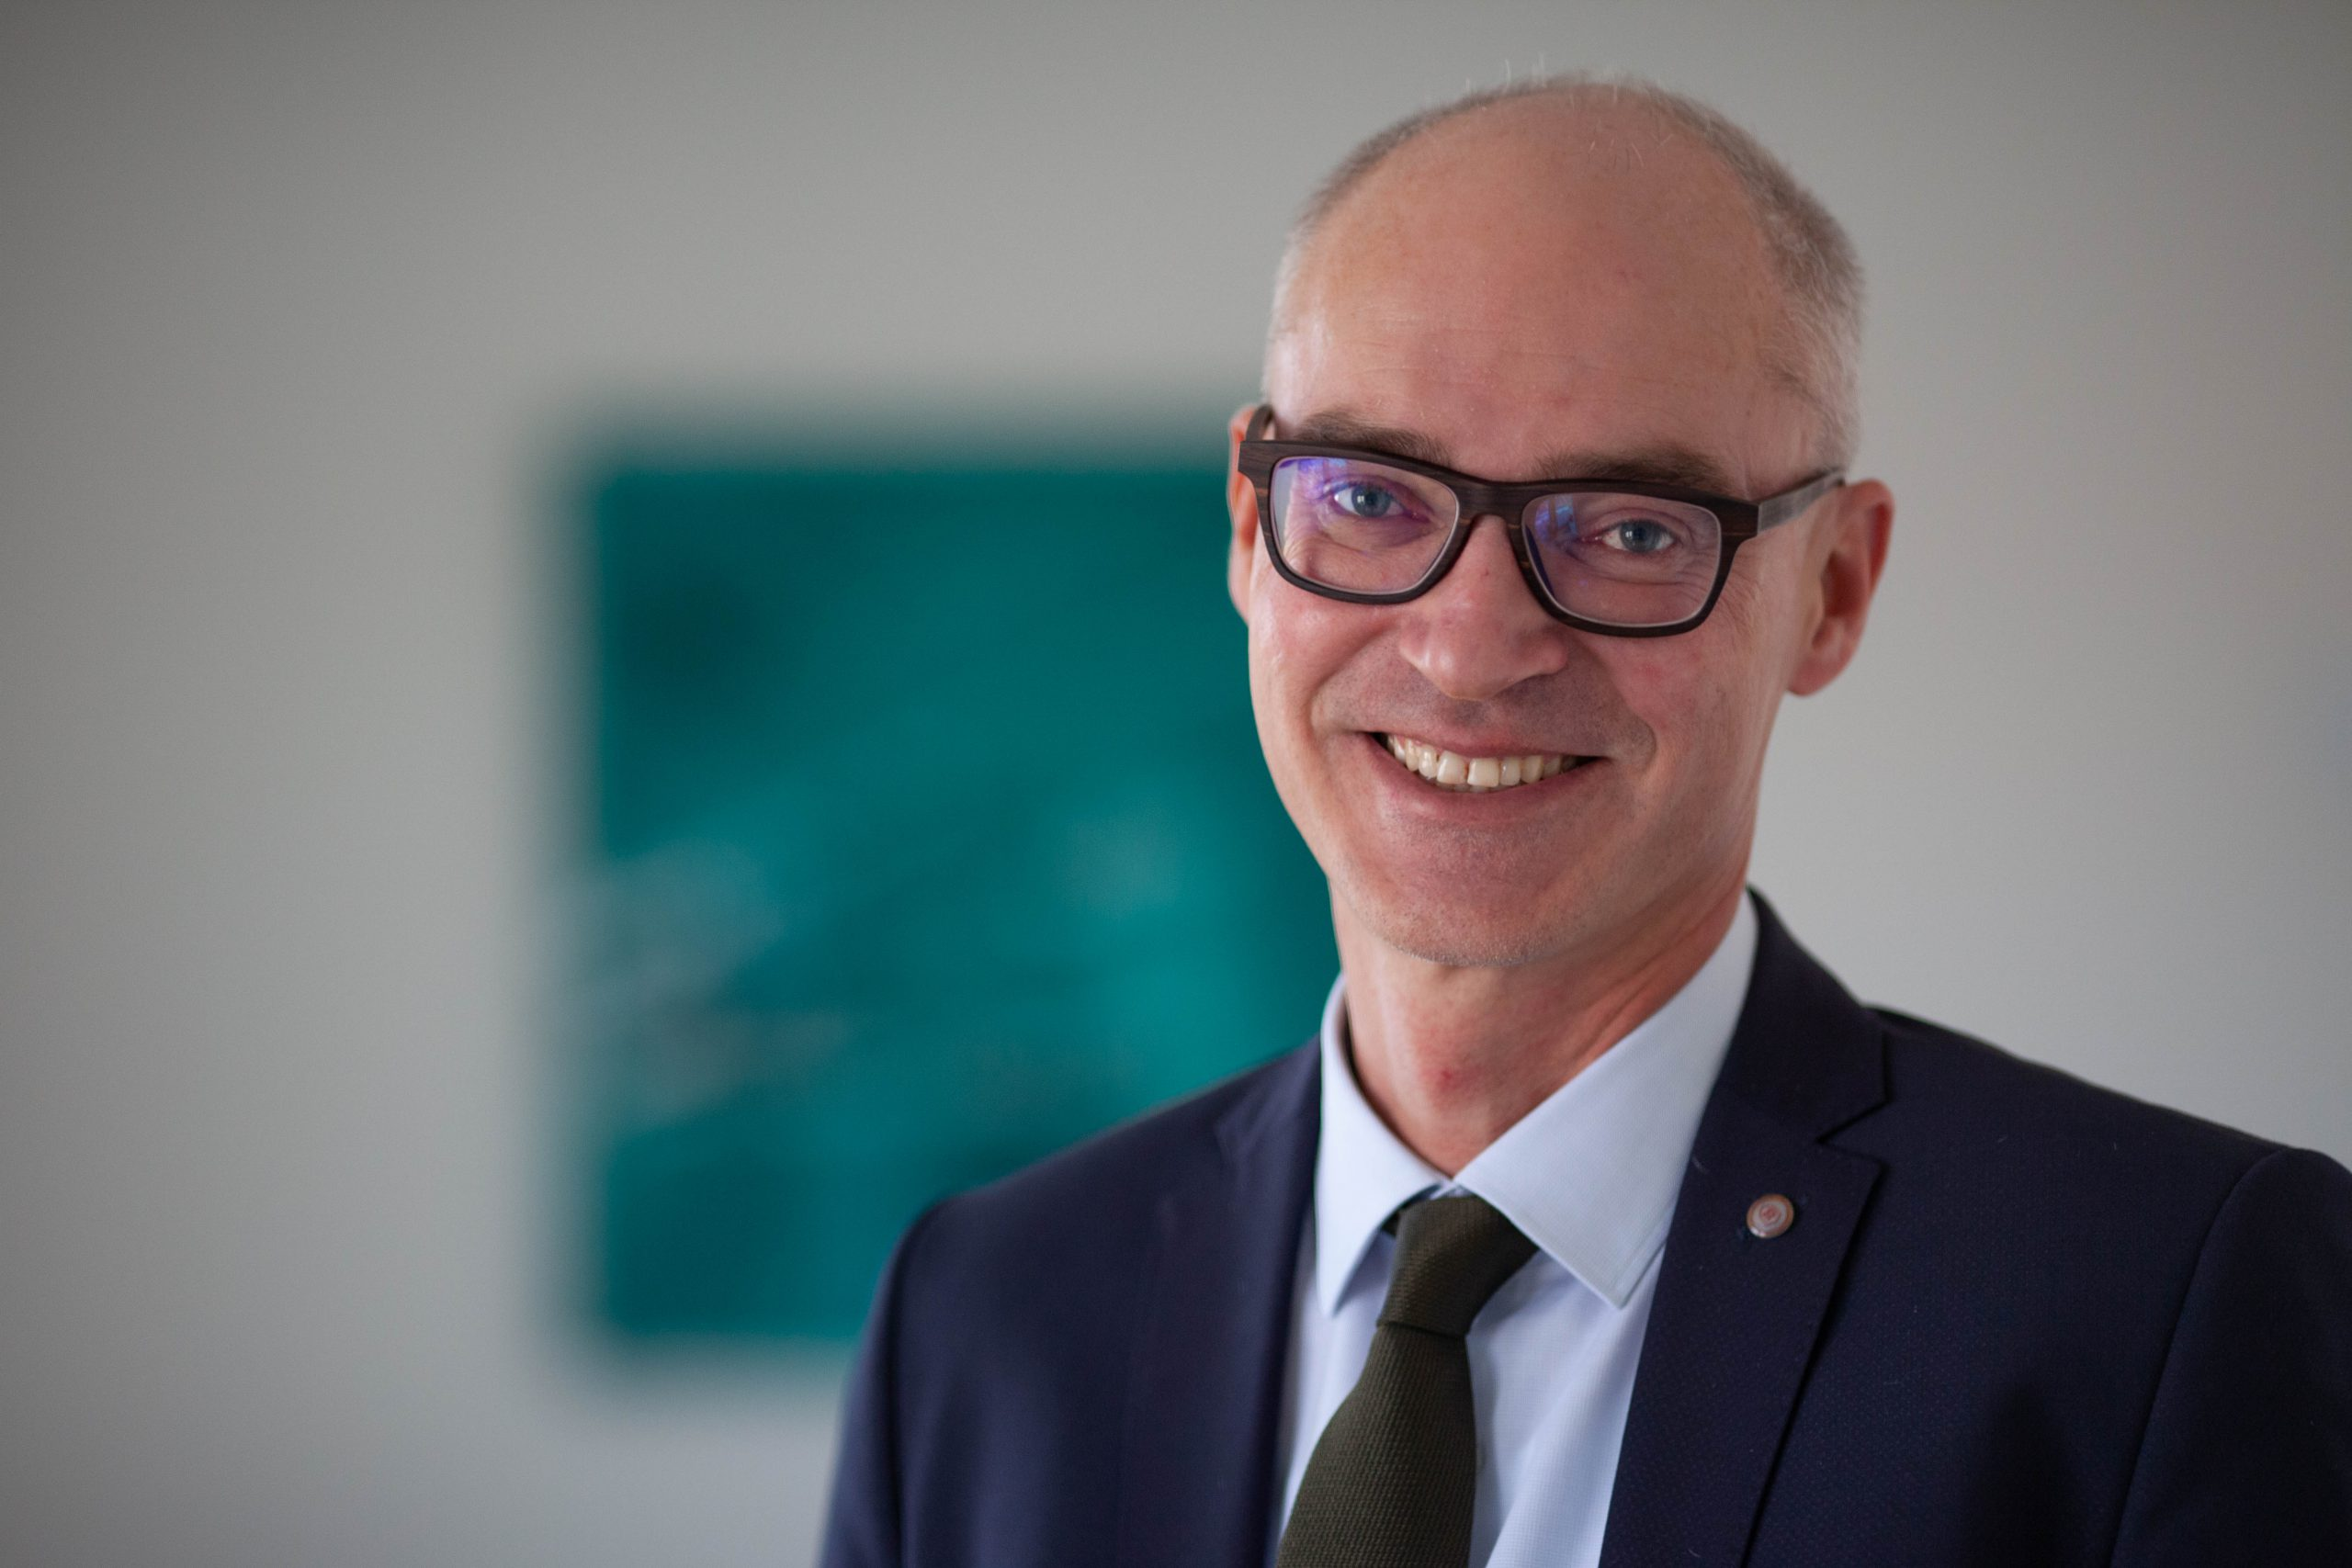 Rechtsanwalt Walter Hippel